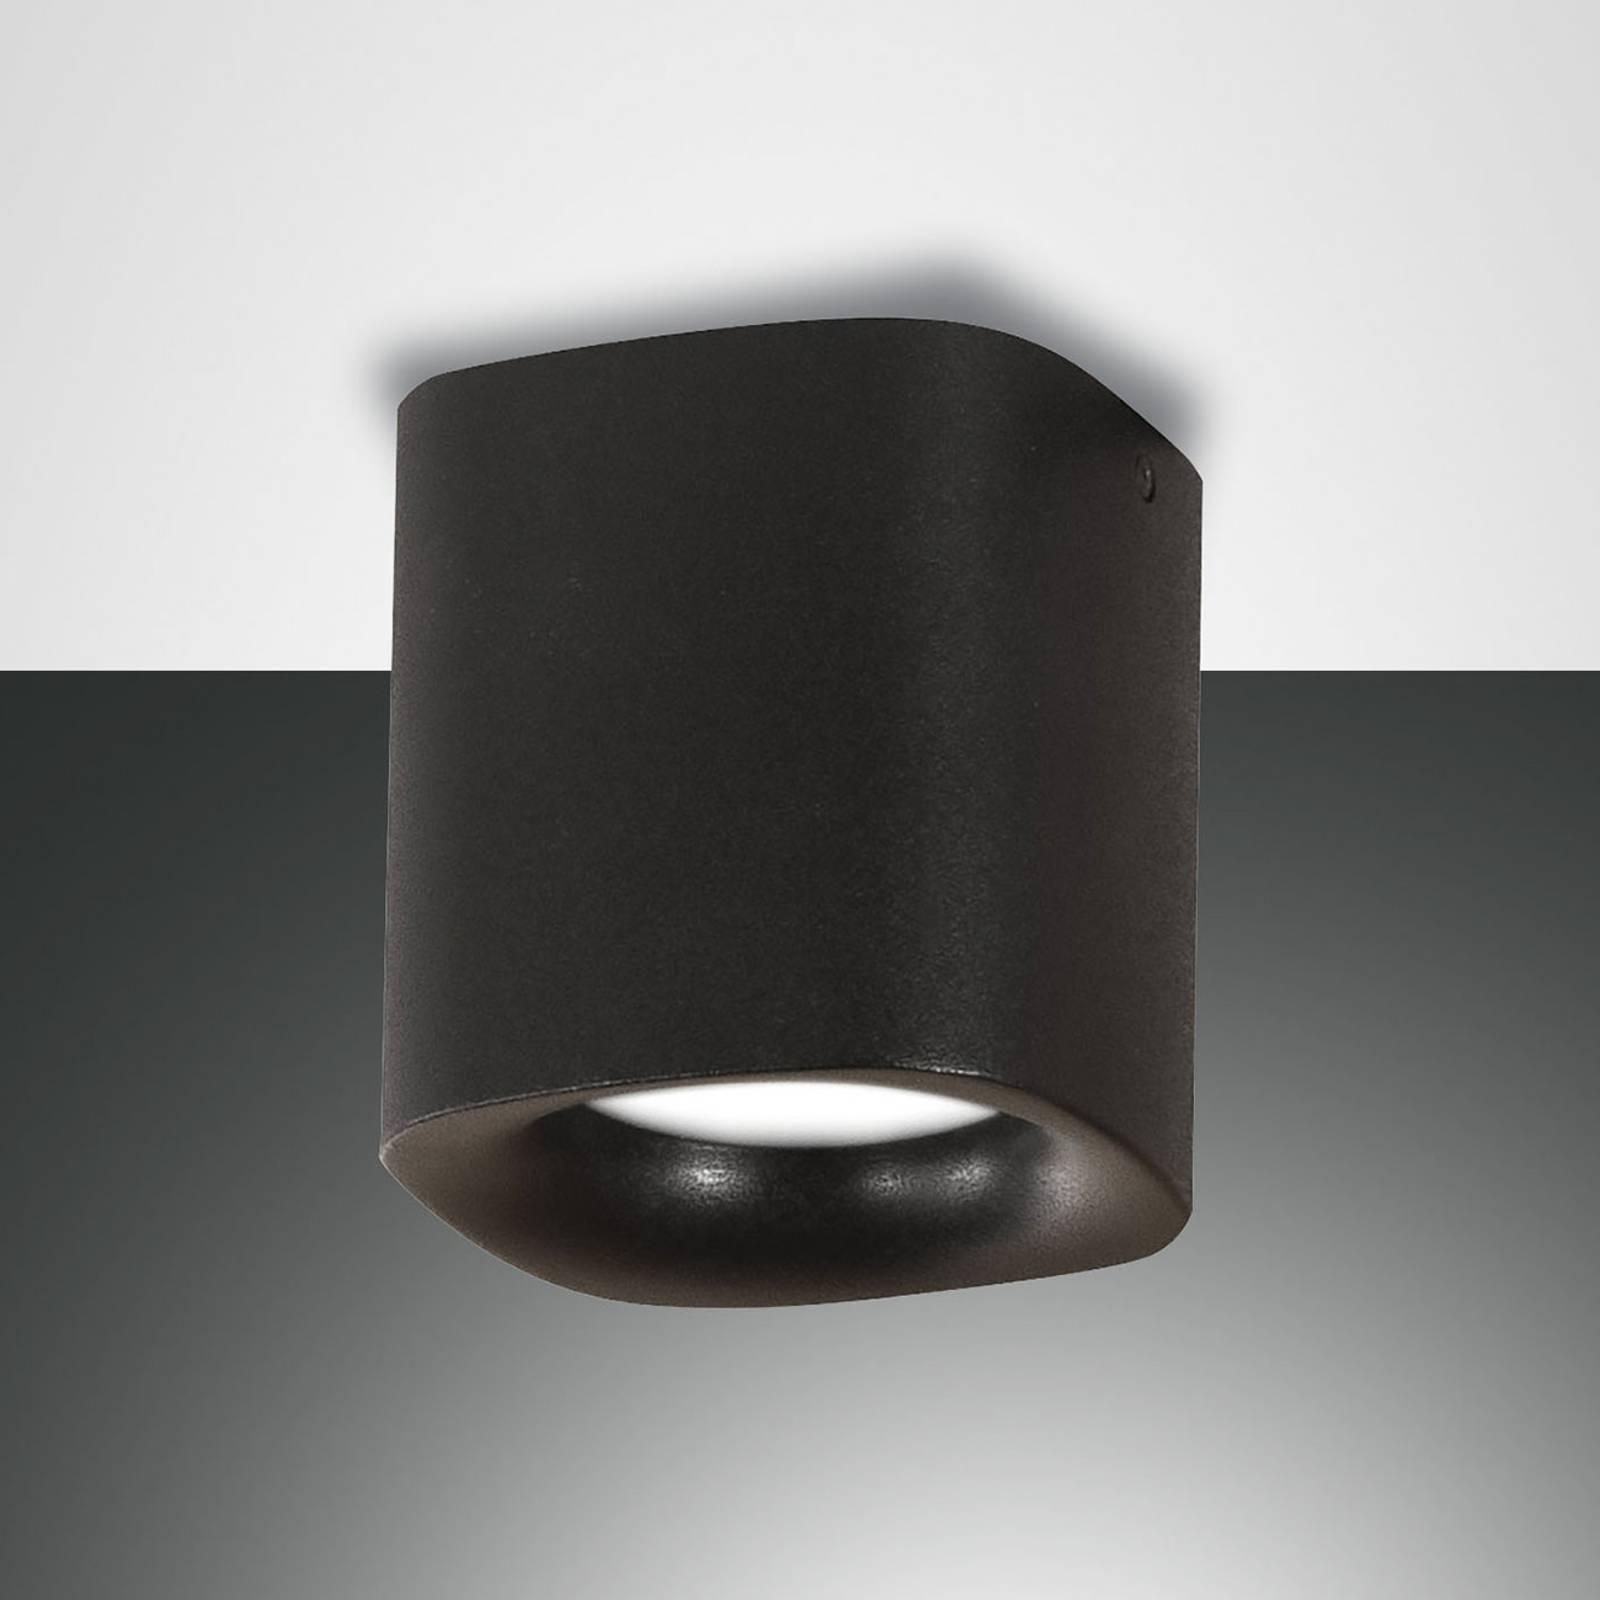 Plafondlamp Smooth, 1-lamp, zwart, IP44